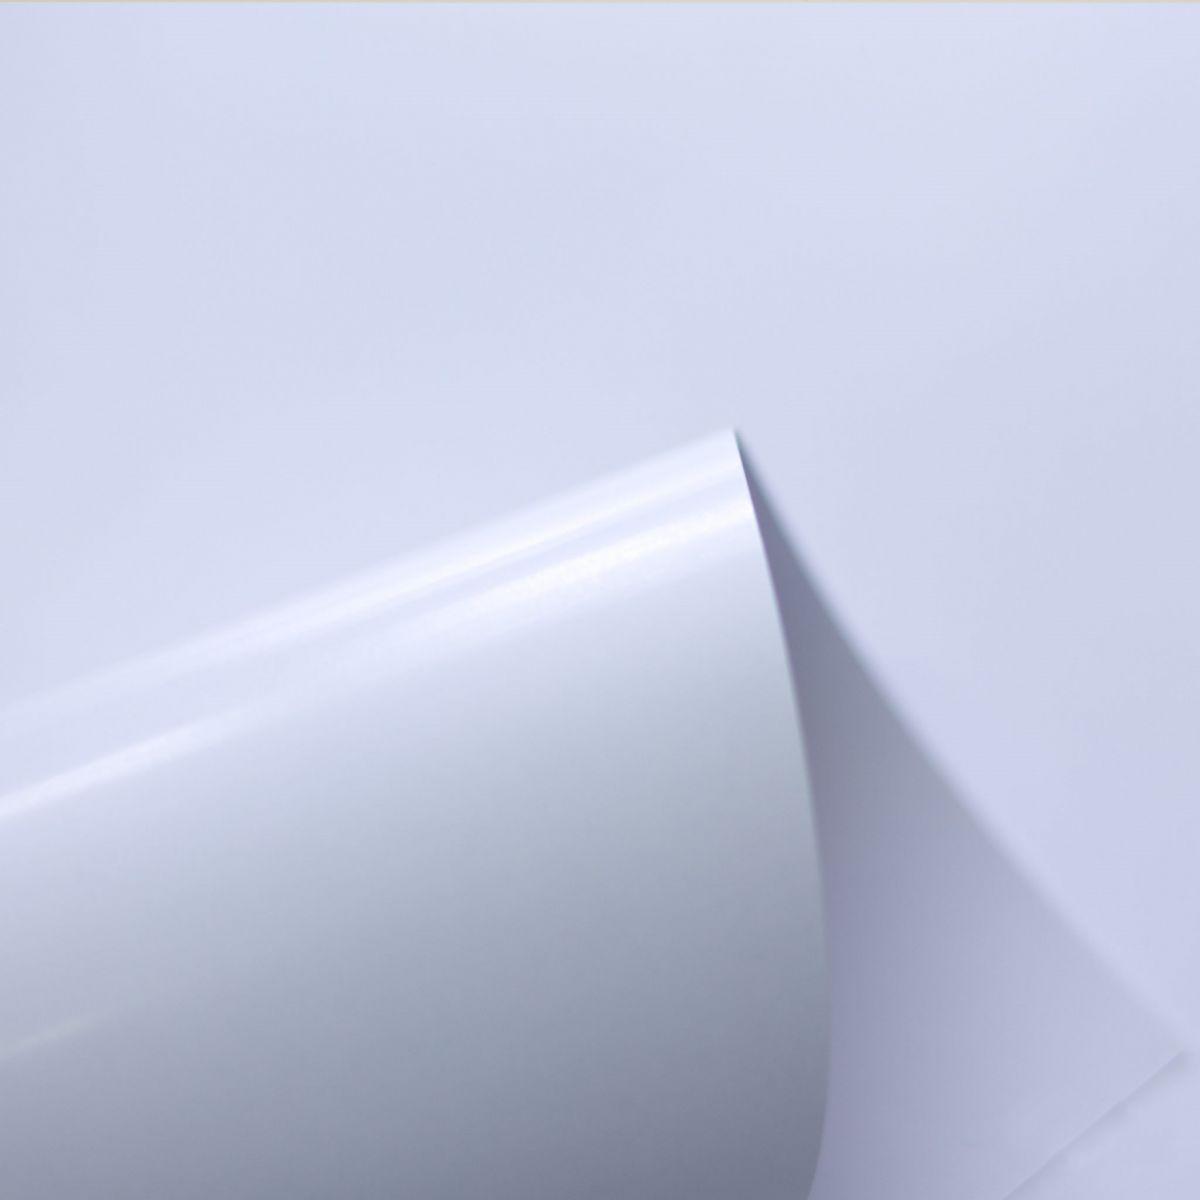 Papel Couche Brilho A4 115gm - 10 Folhas